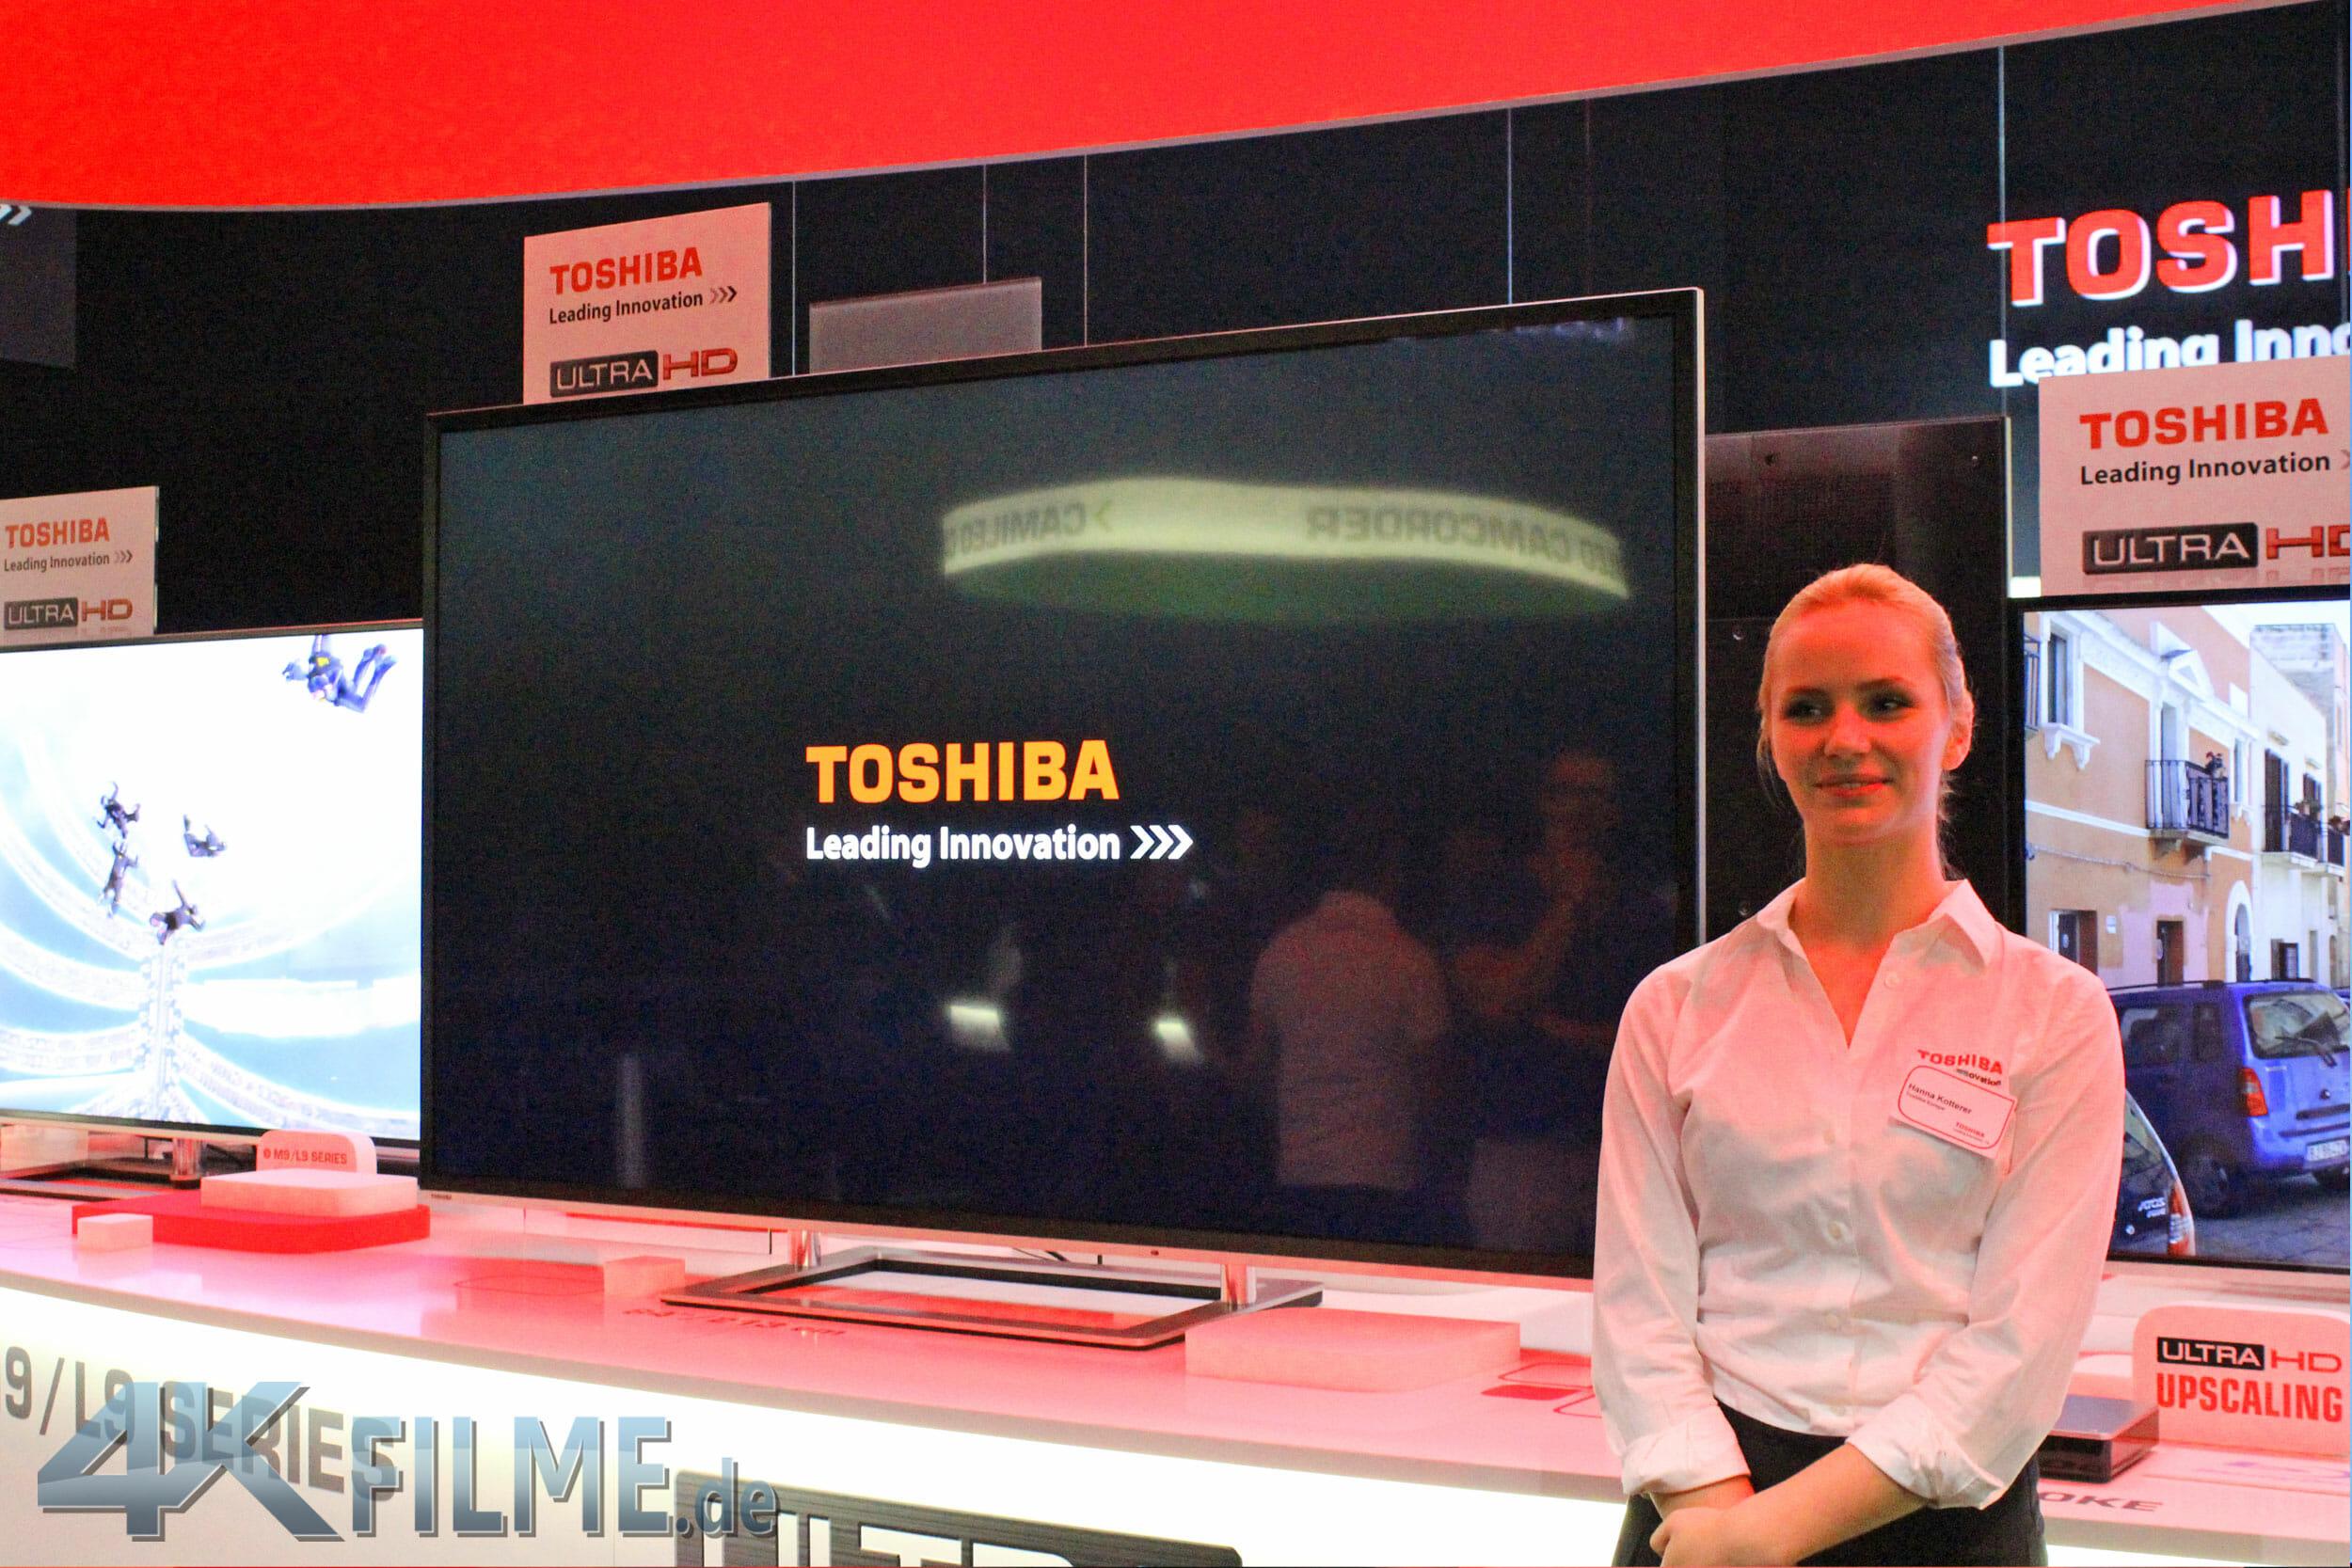 Toshiba_M9-4K-TV_1